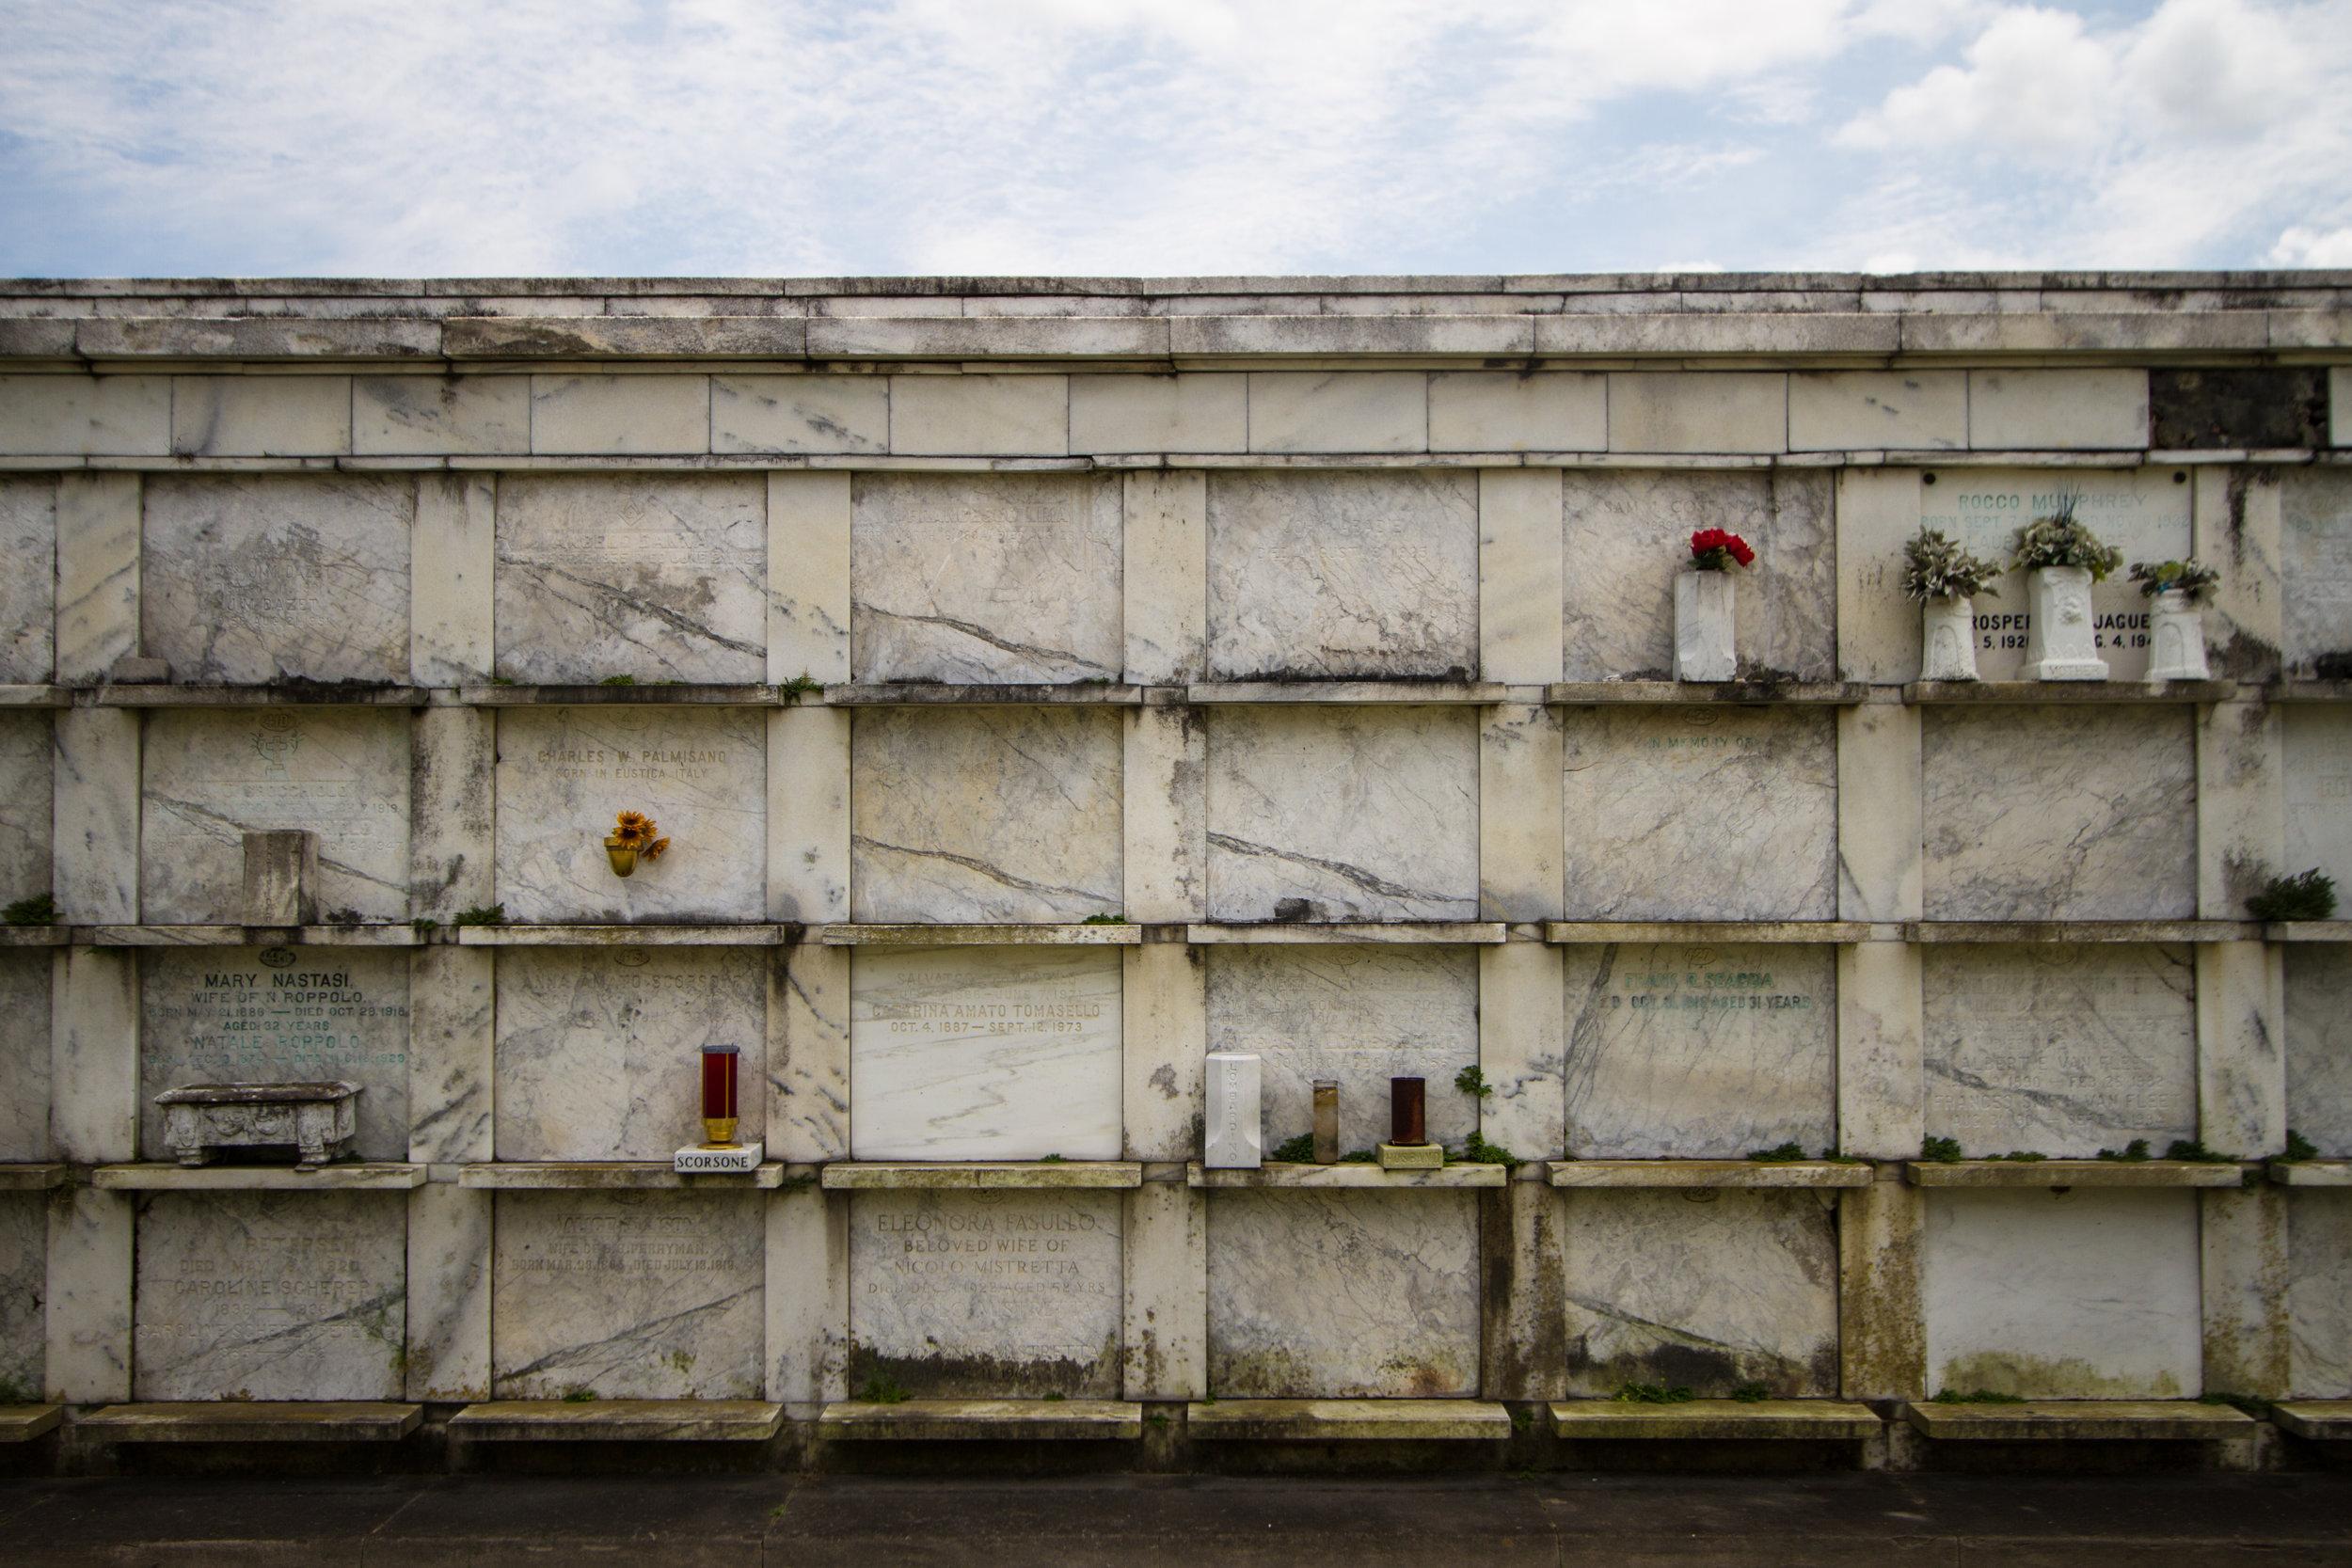 Metairie Cemetery, New Orleans, LA, US